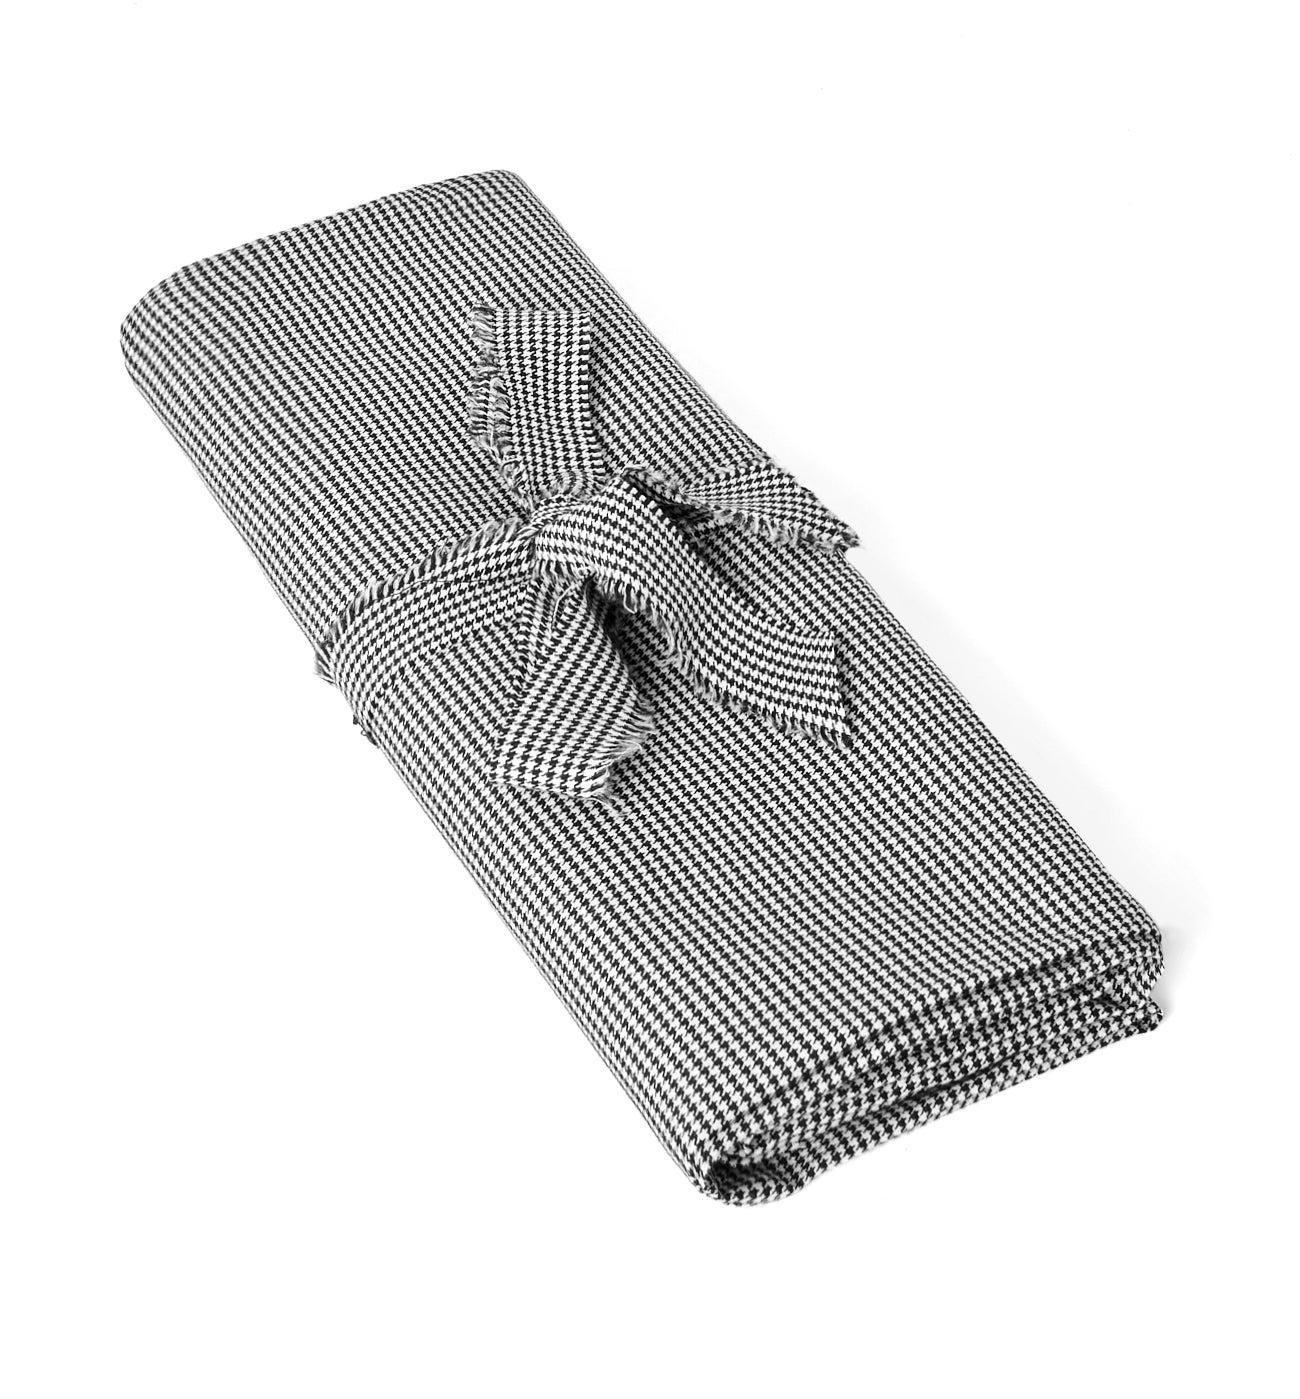 Coupon de tissu twill carreaux